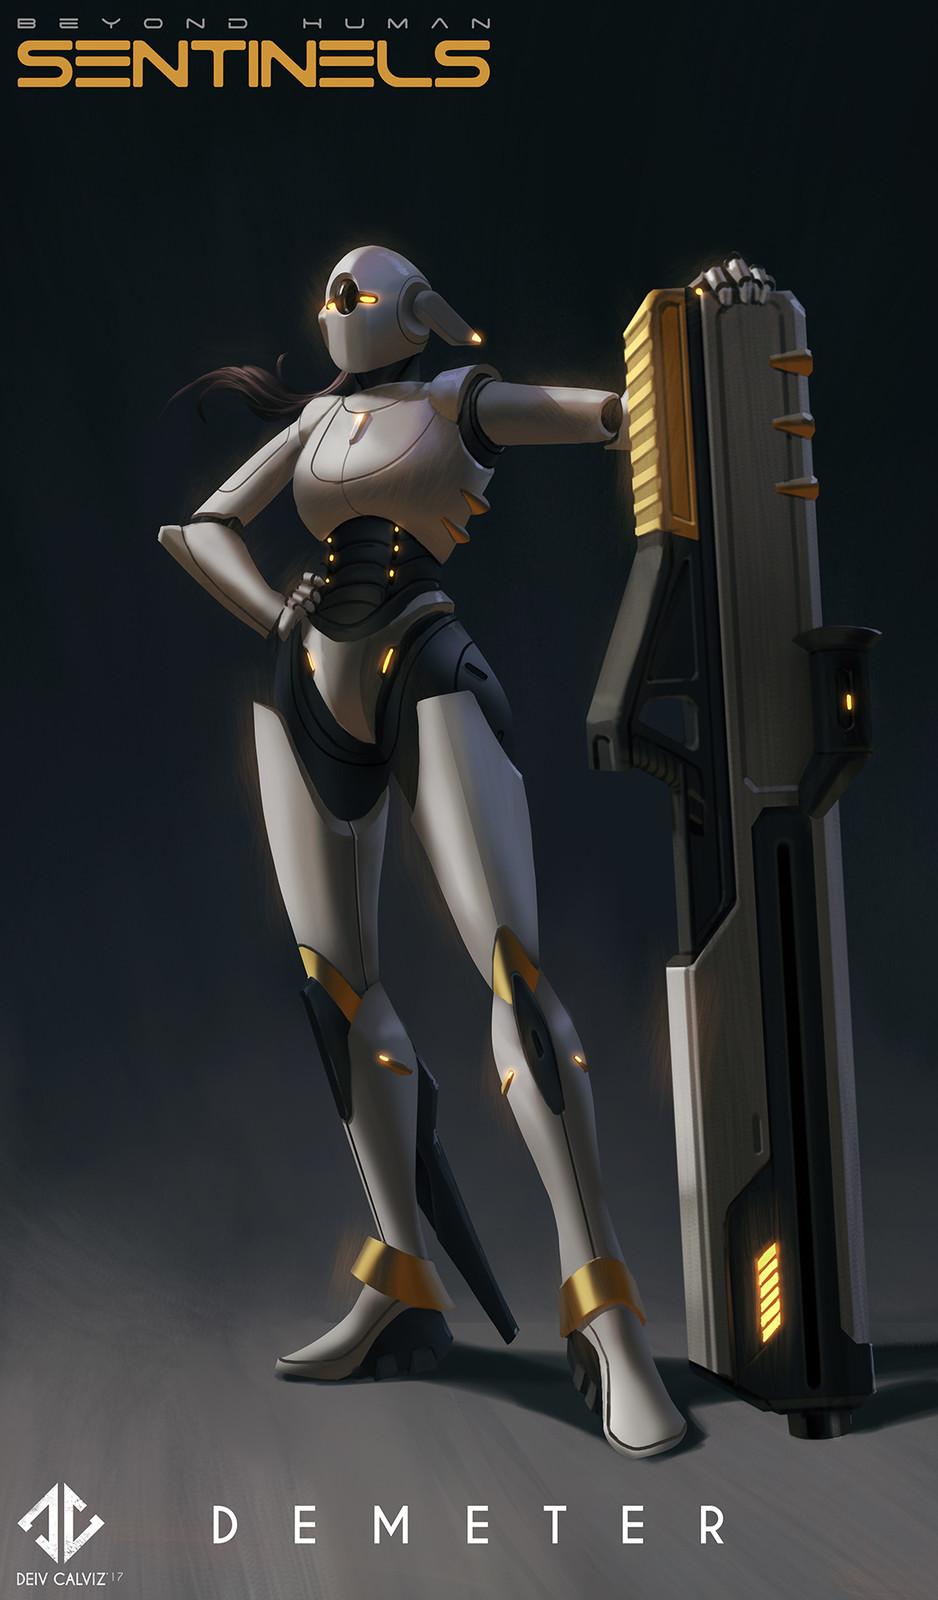 Demeter - Beyond Human